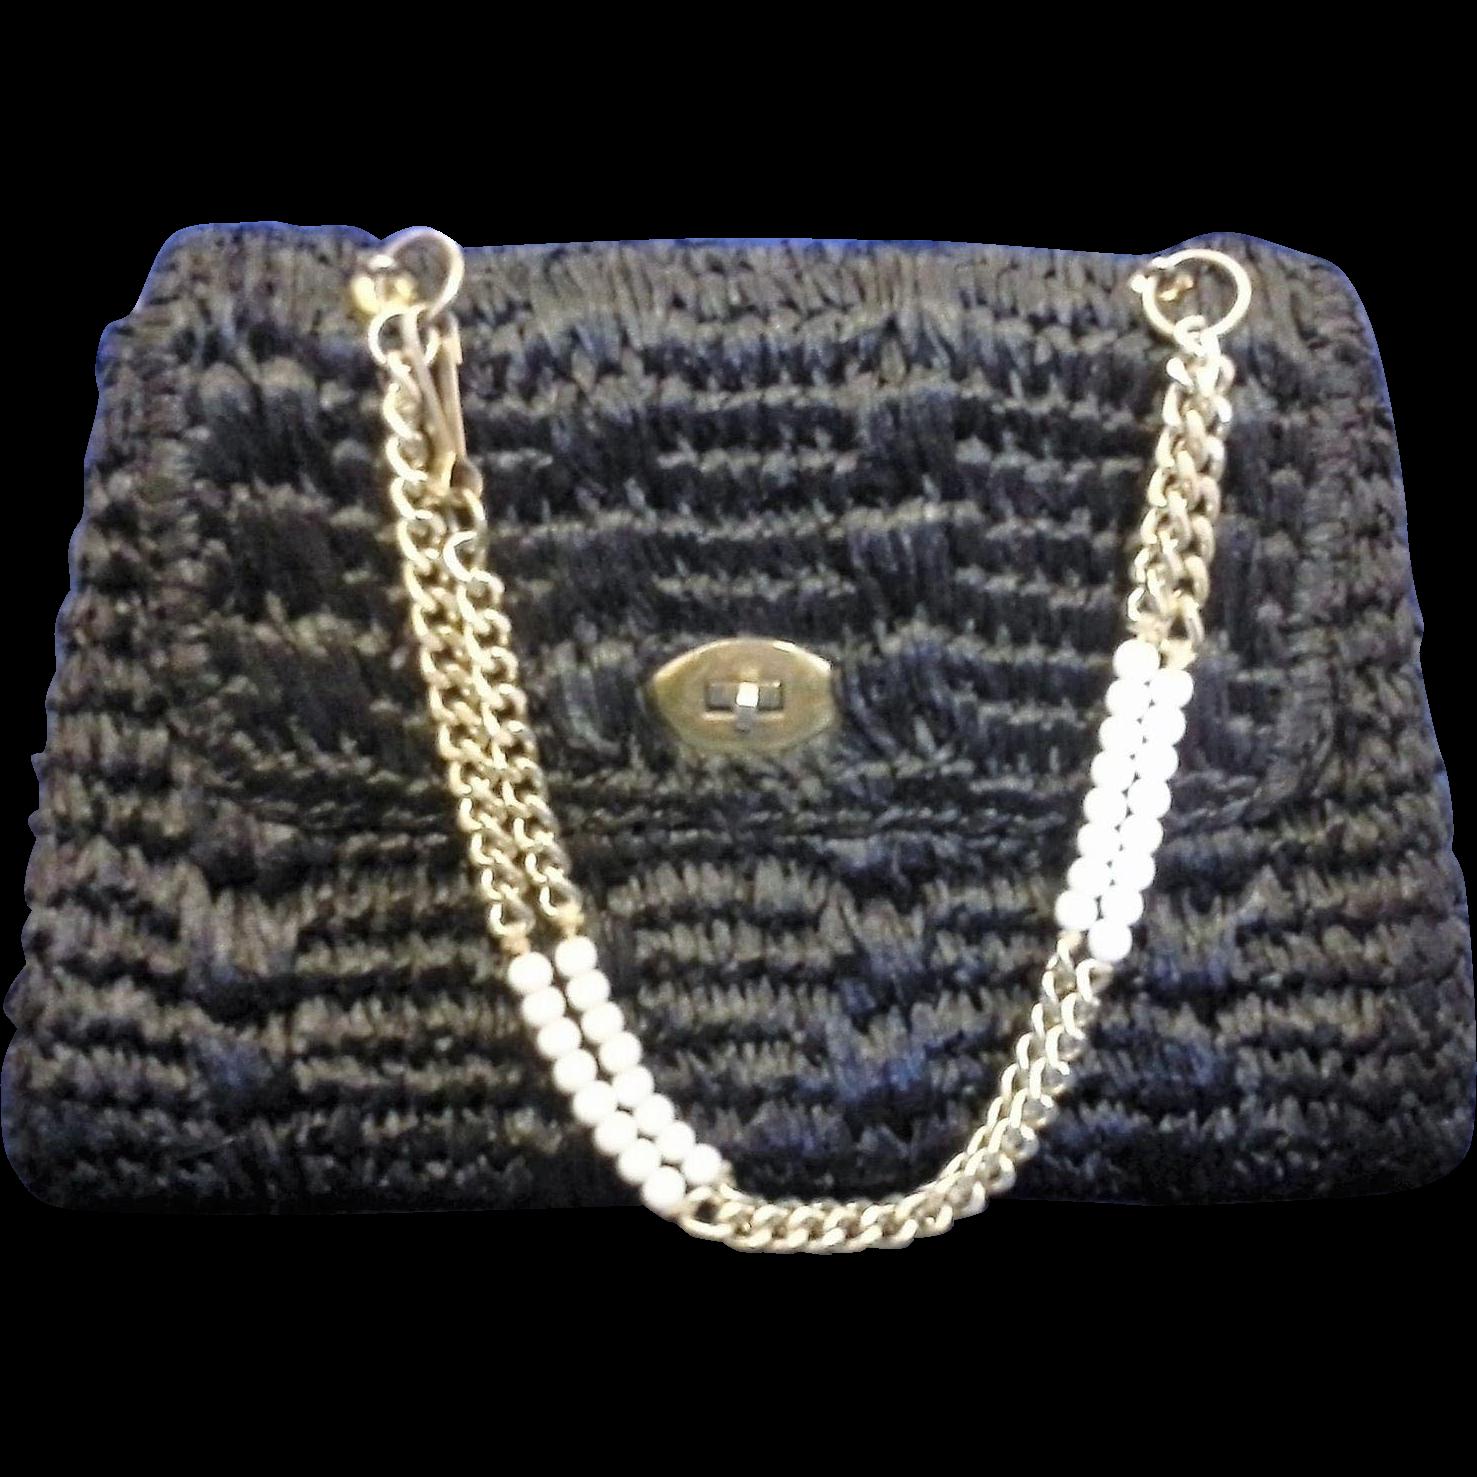 Gaymode Vintage Black Raffia Purse Handbag Chain Handle